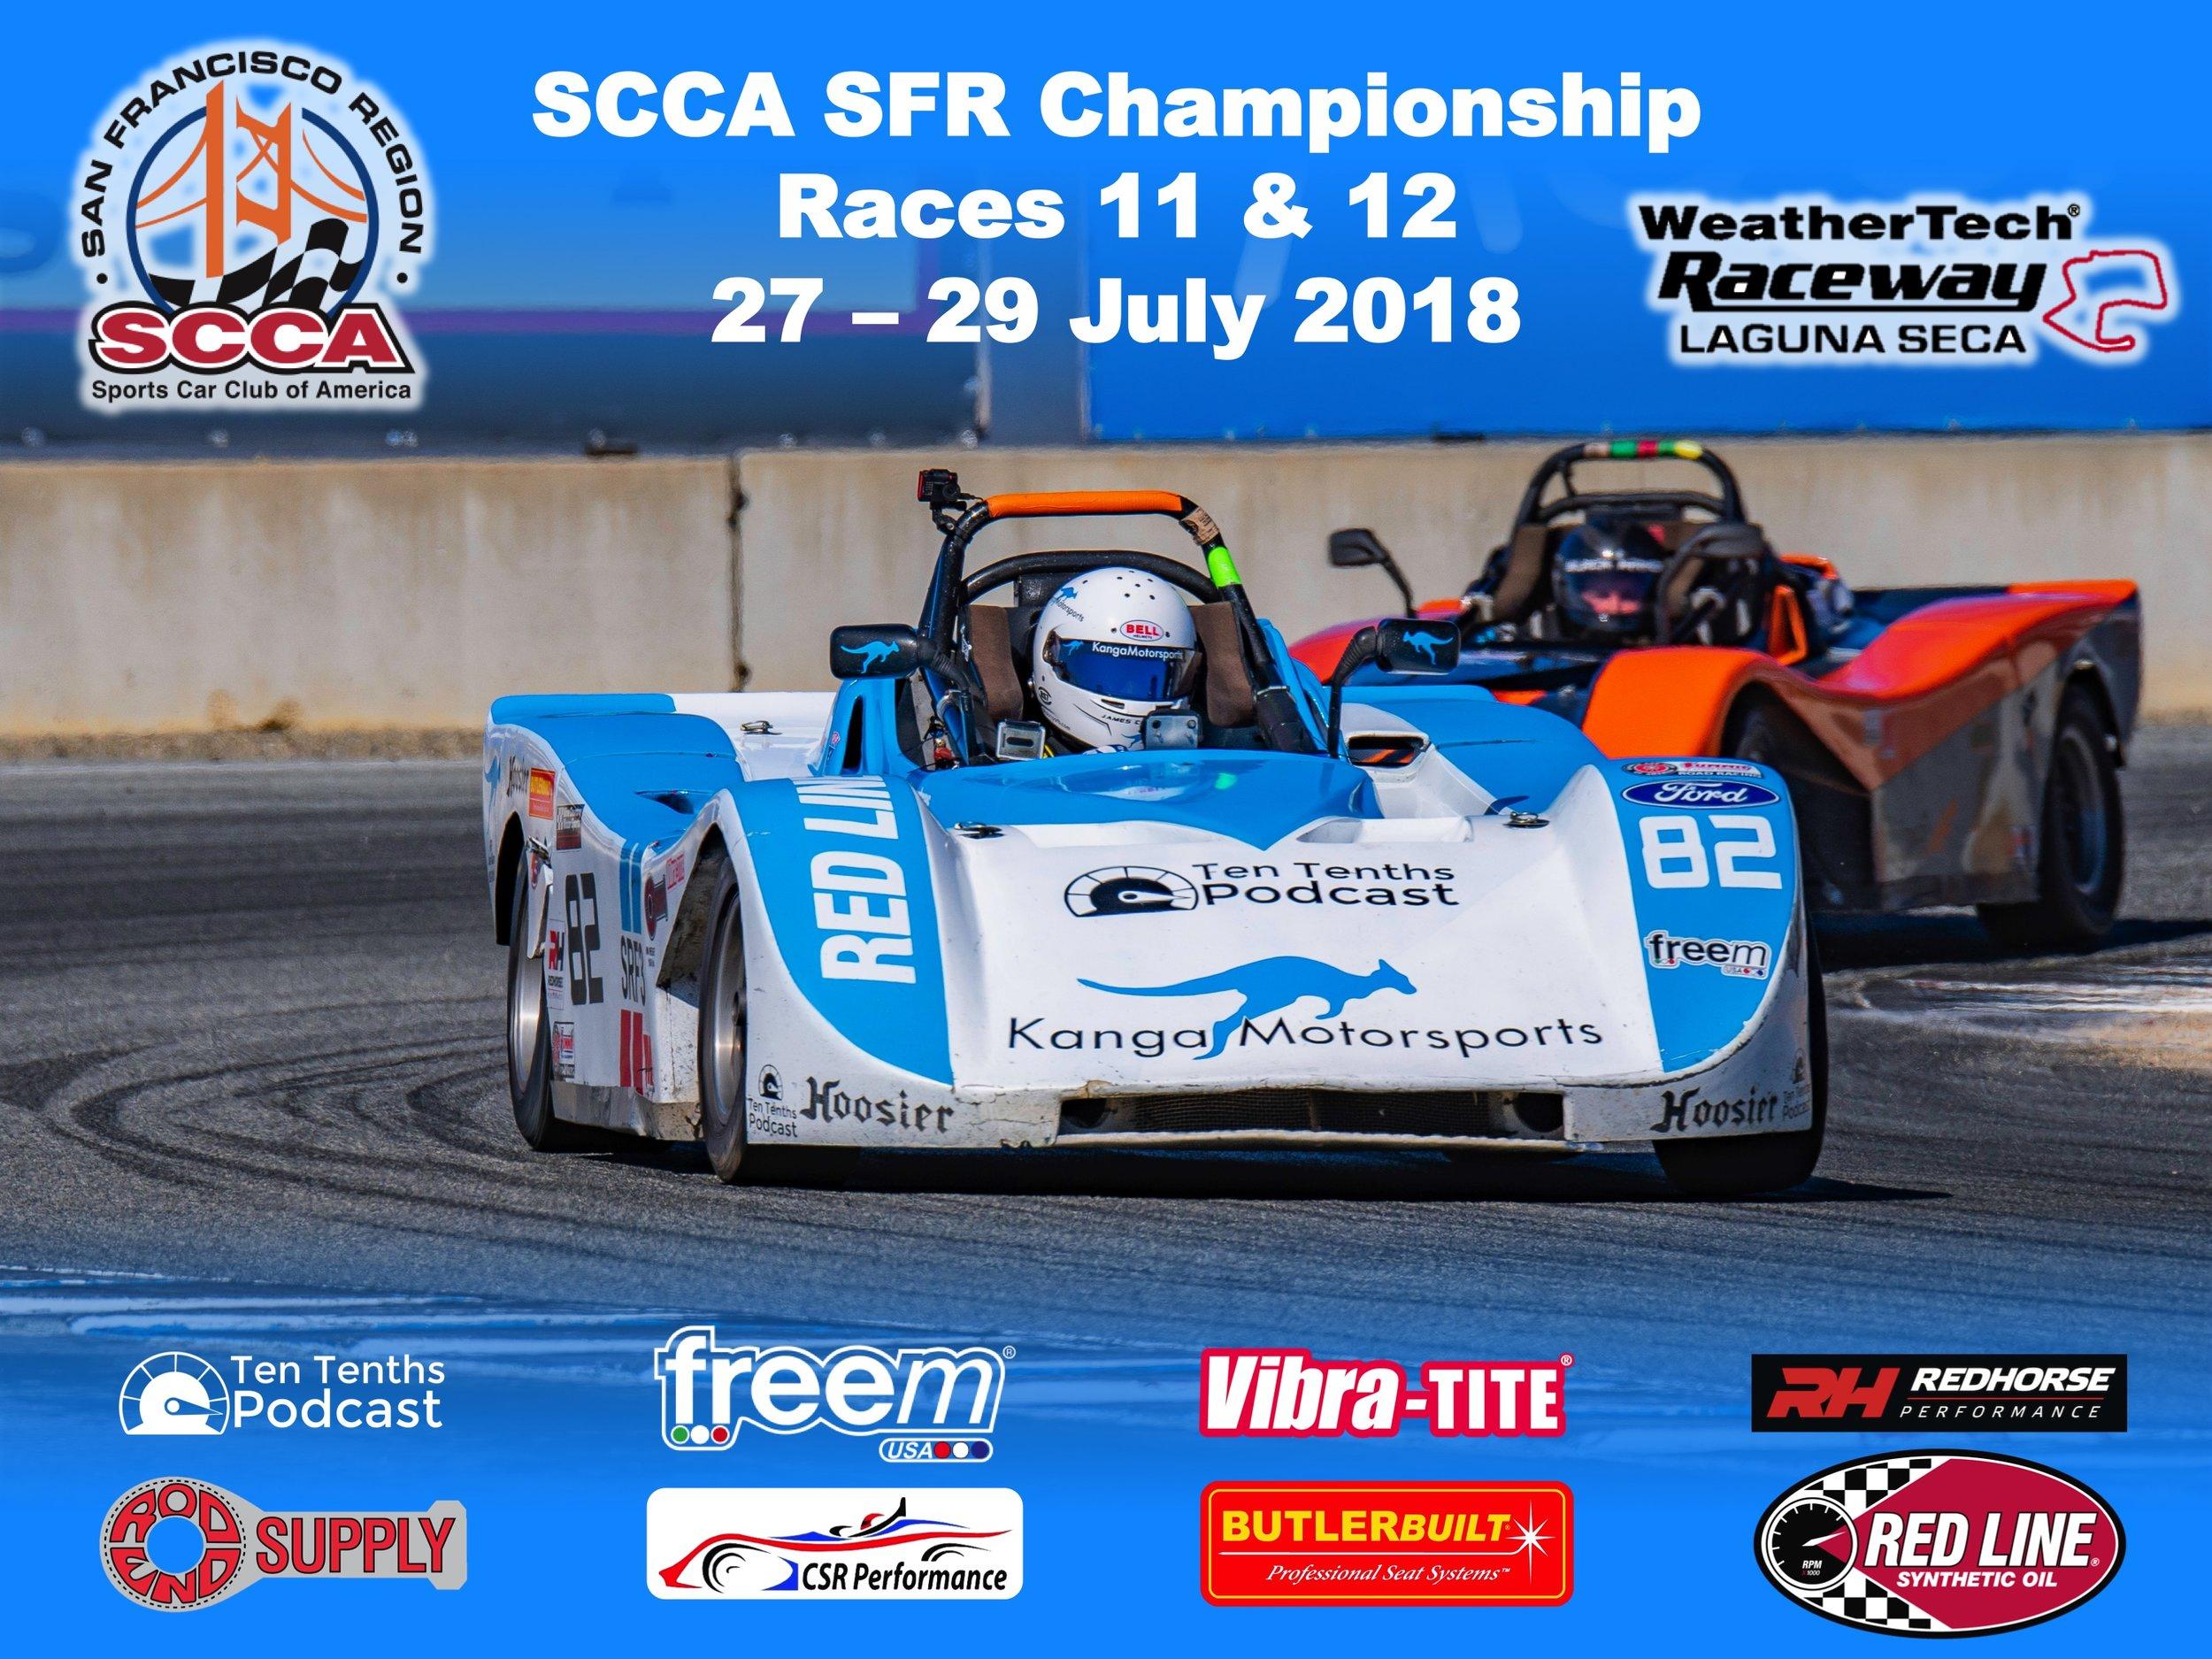 2018 Races 11 & 12 WTRLS.jpg